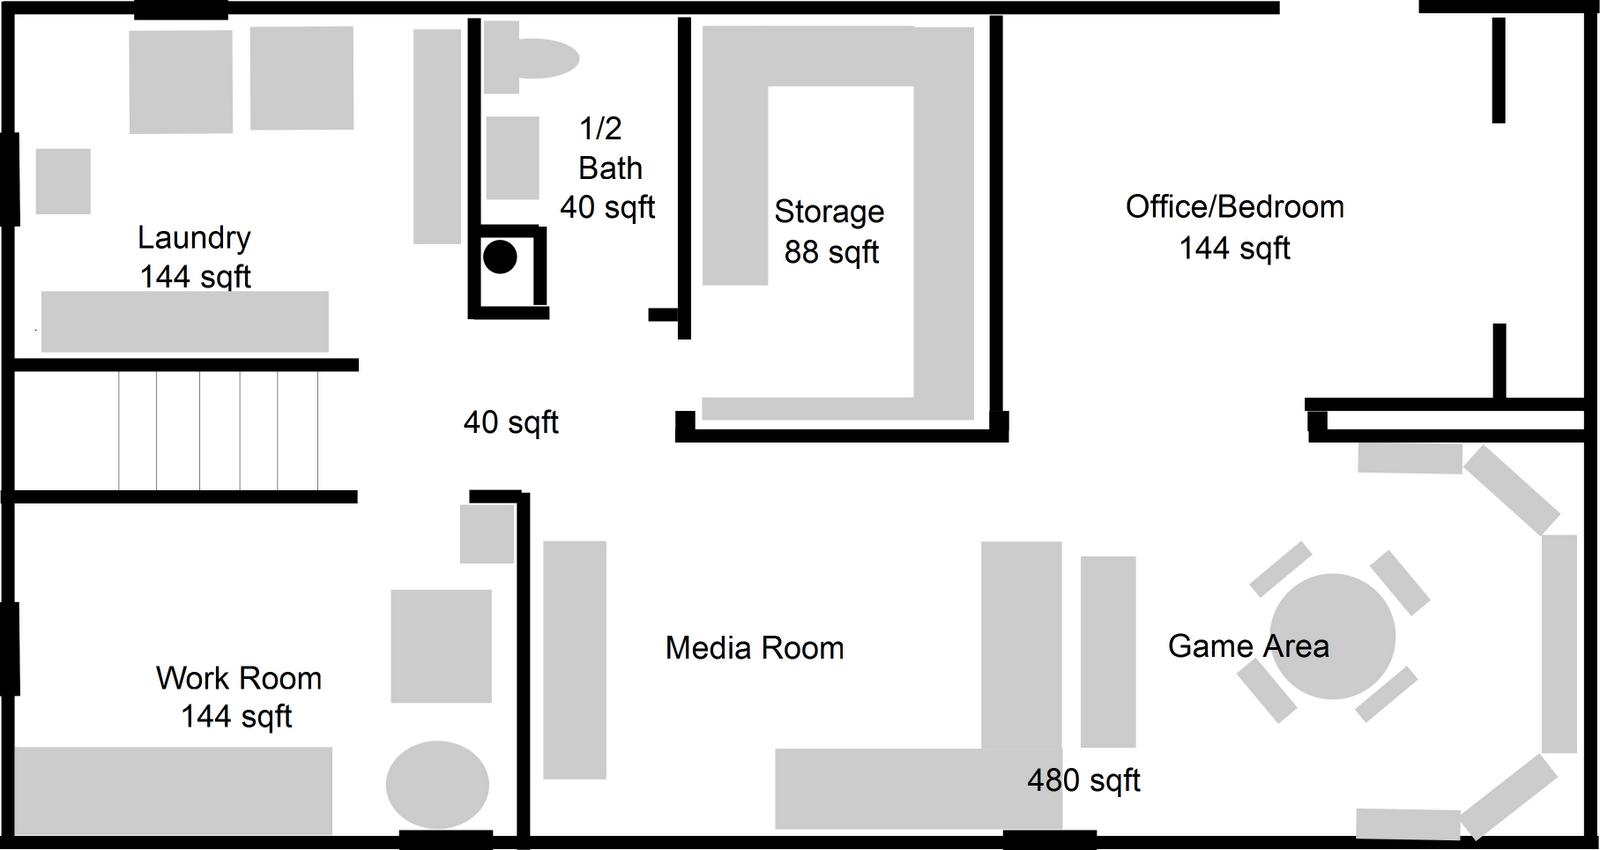 Basement Bathroom Design Layout Stunning Basement Floor Plans Layouts  Basement Planning The Plan Inspiration